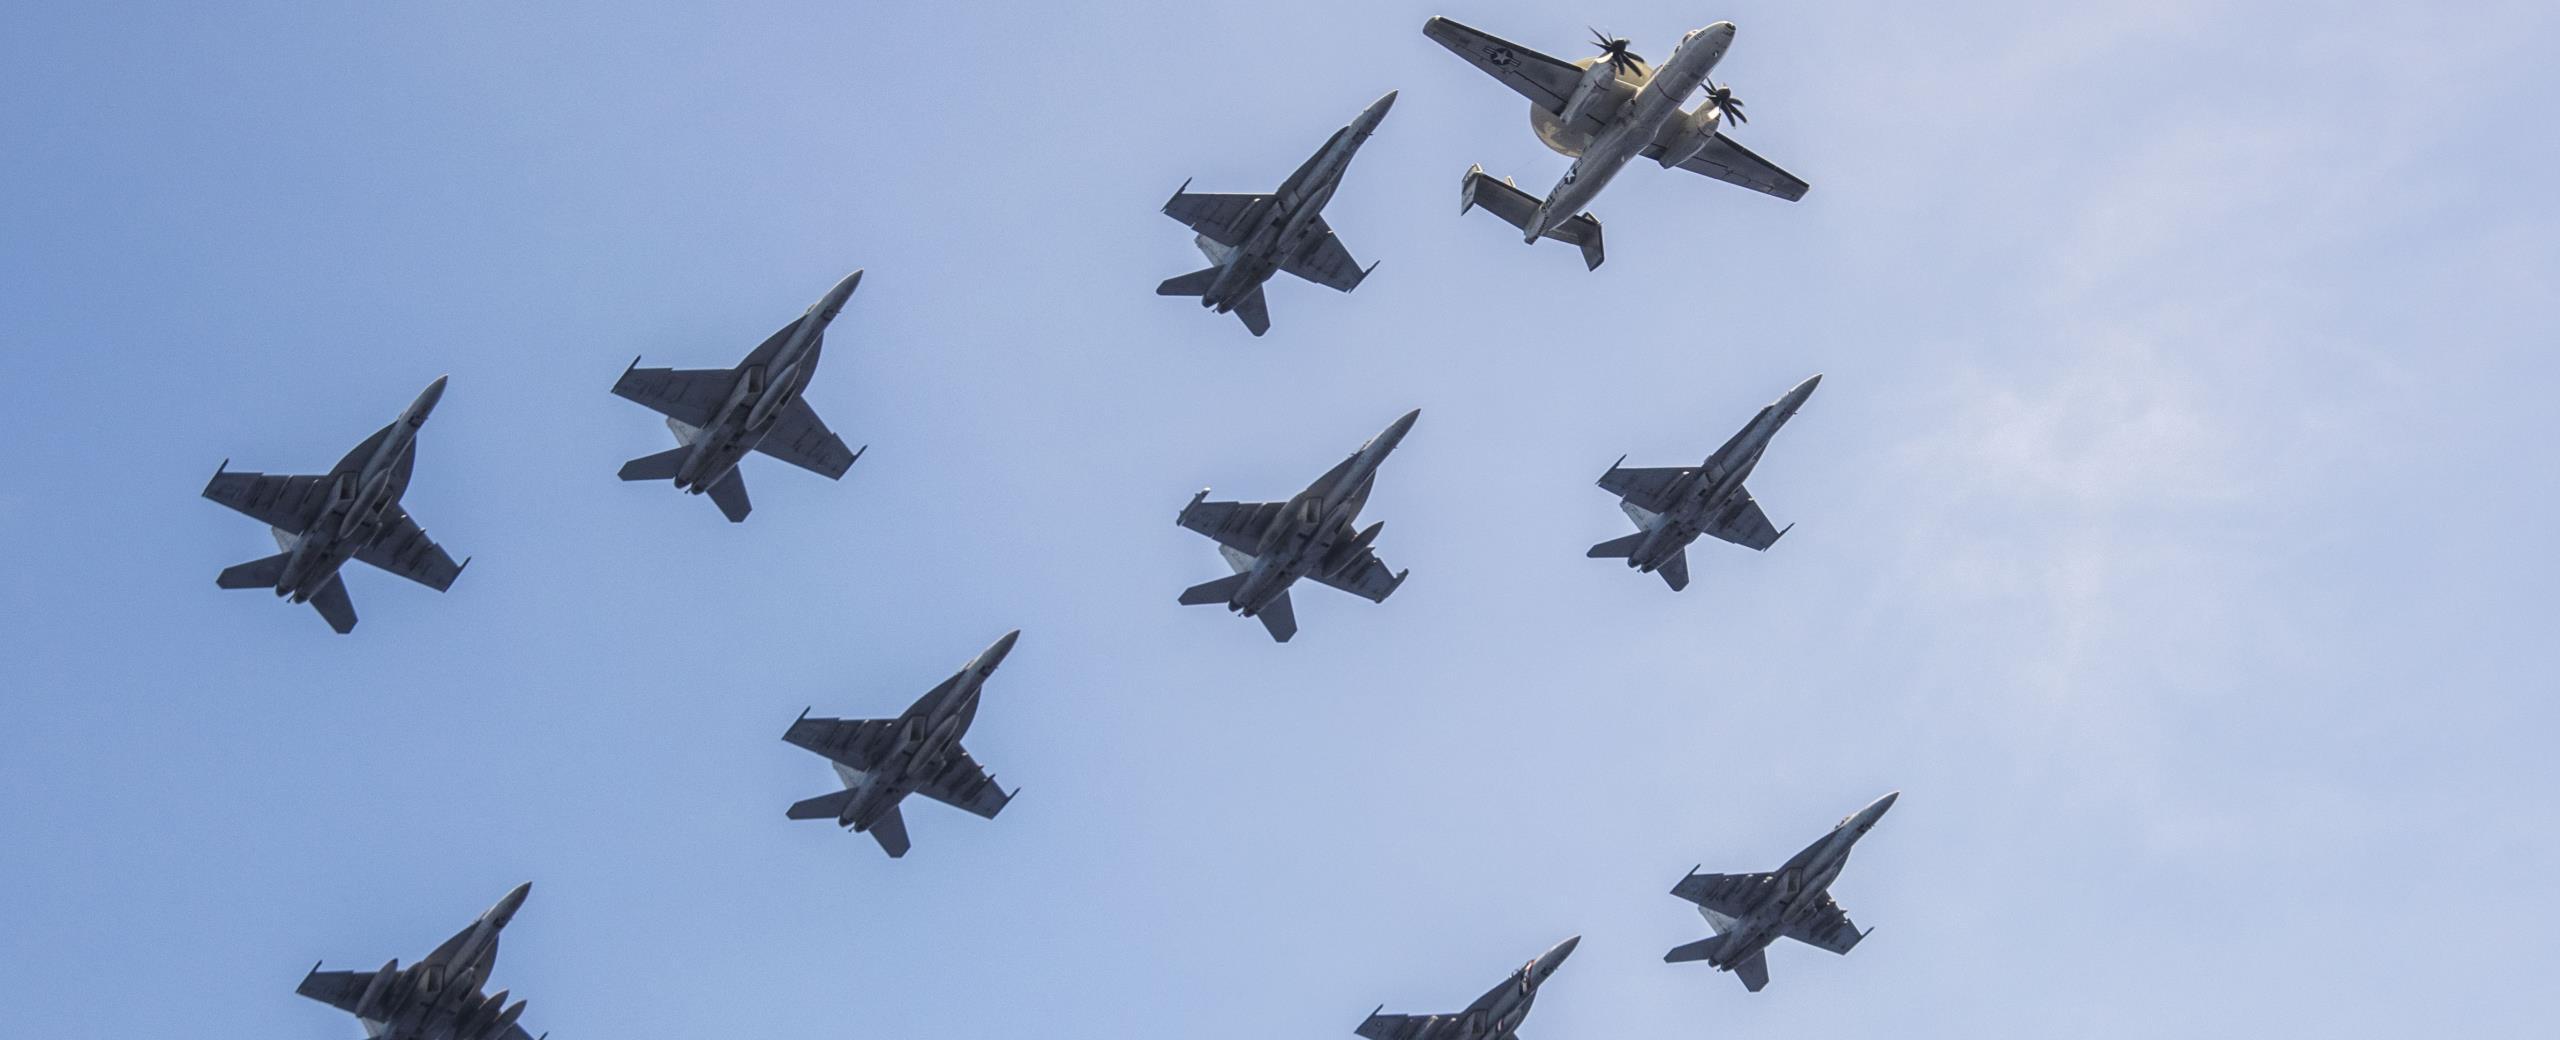 Jets flying